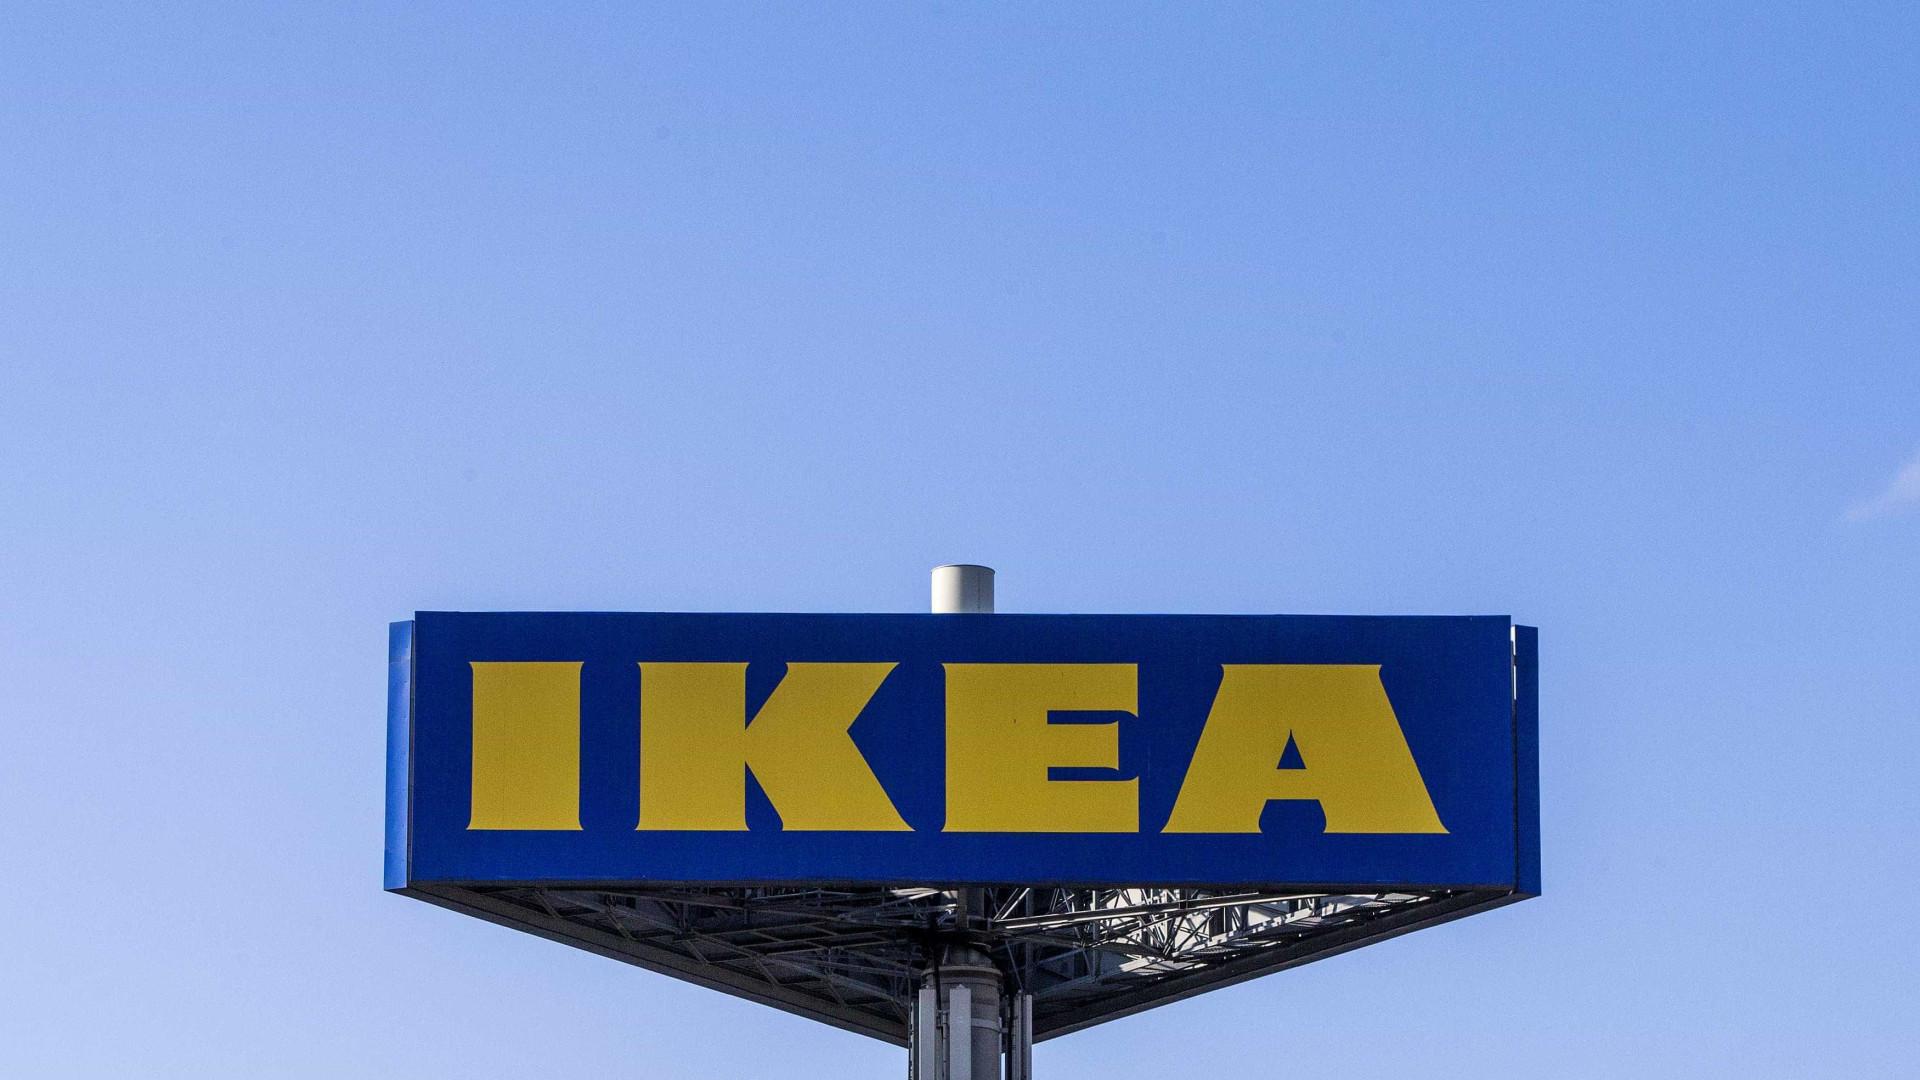 Cliente alerta: Taça da IKEA representa risco de incêndio